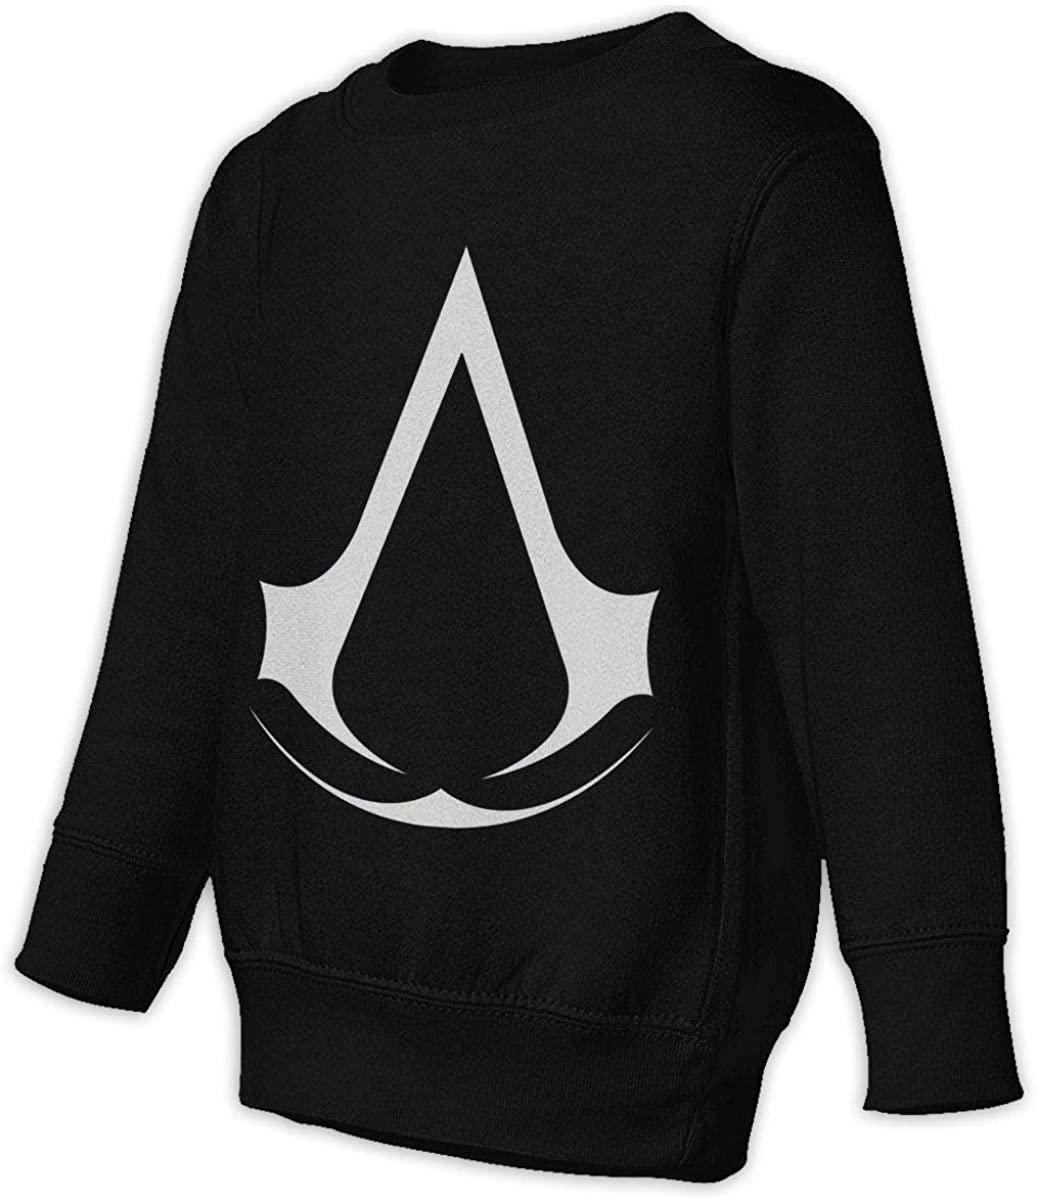 HUABDWA Classic Assassin Creed Video Game Series Unisex Sweatshirt Youth Boy and Girls Pullover Sweatshirt Black